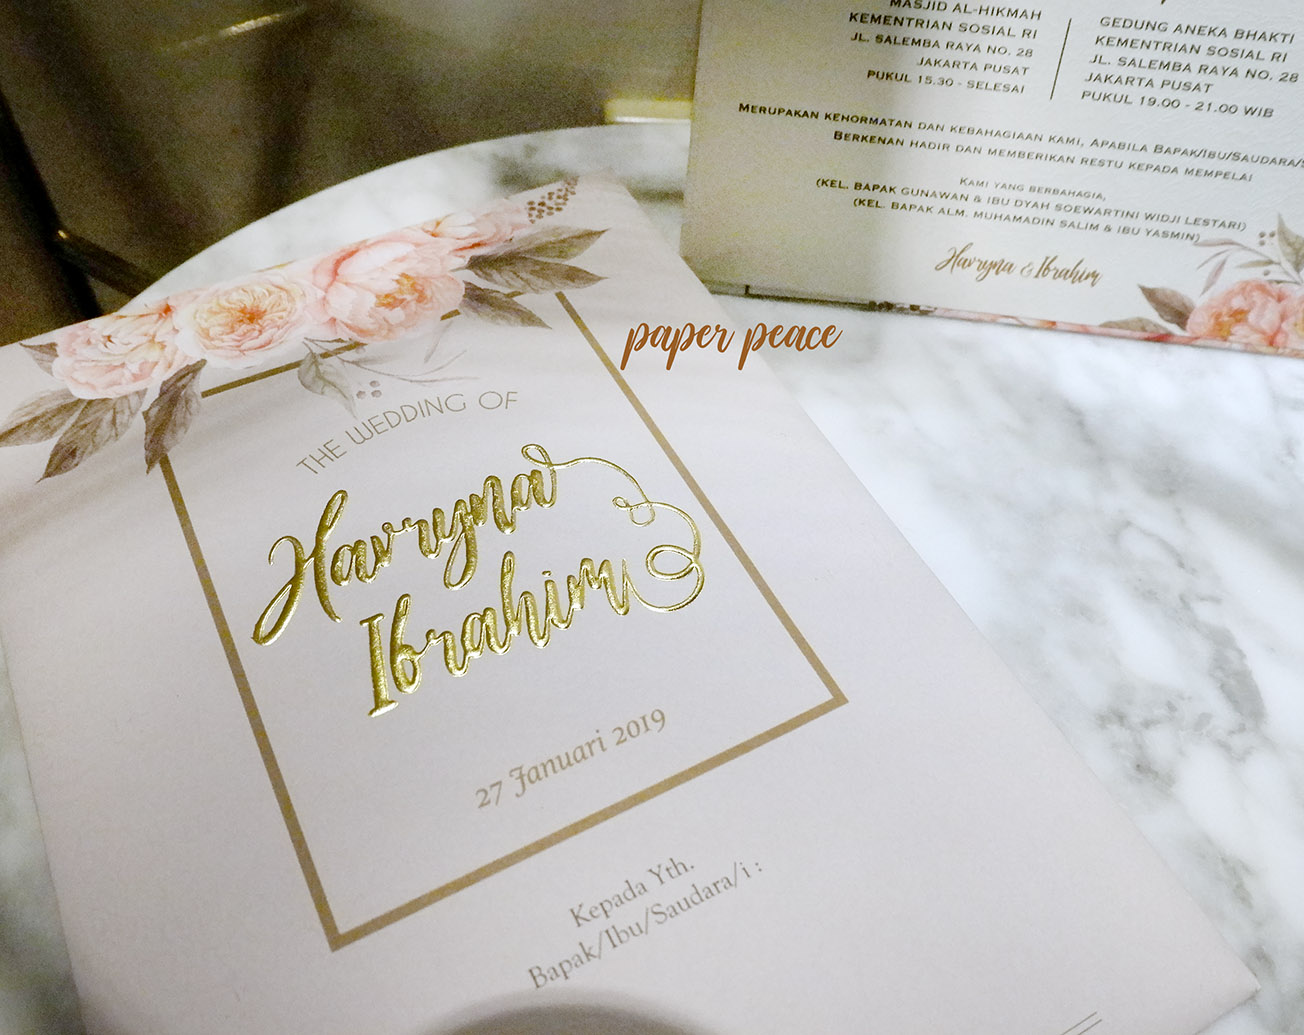 Paperpeace Wedding Invitation For Ms Havryna Mr Ibrahim